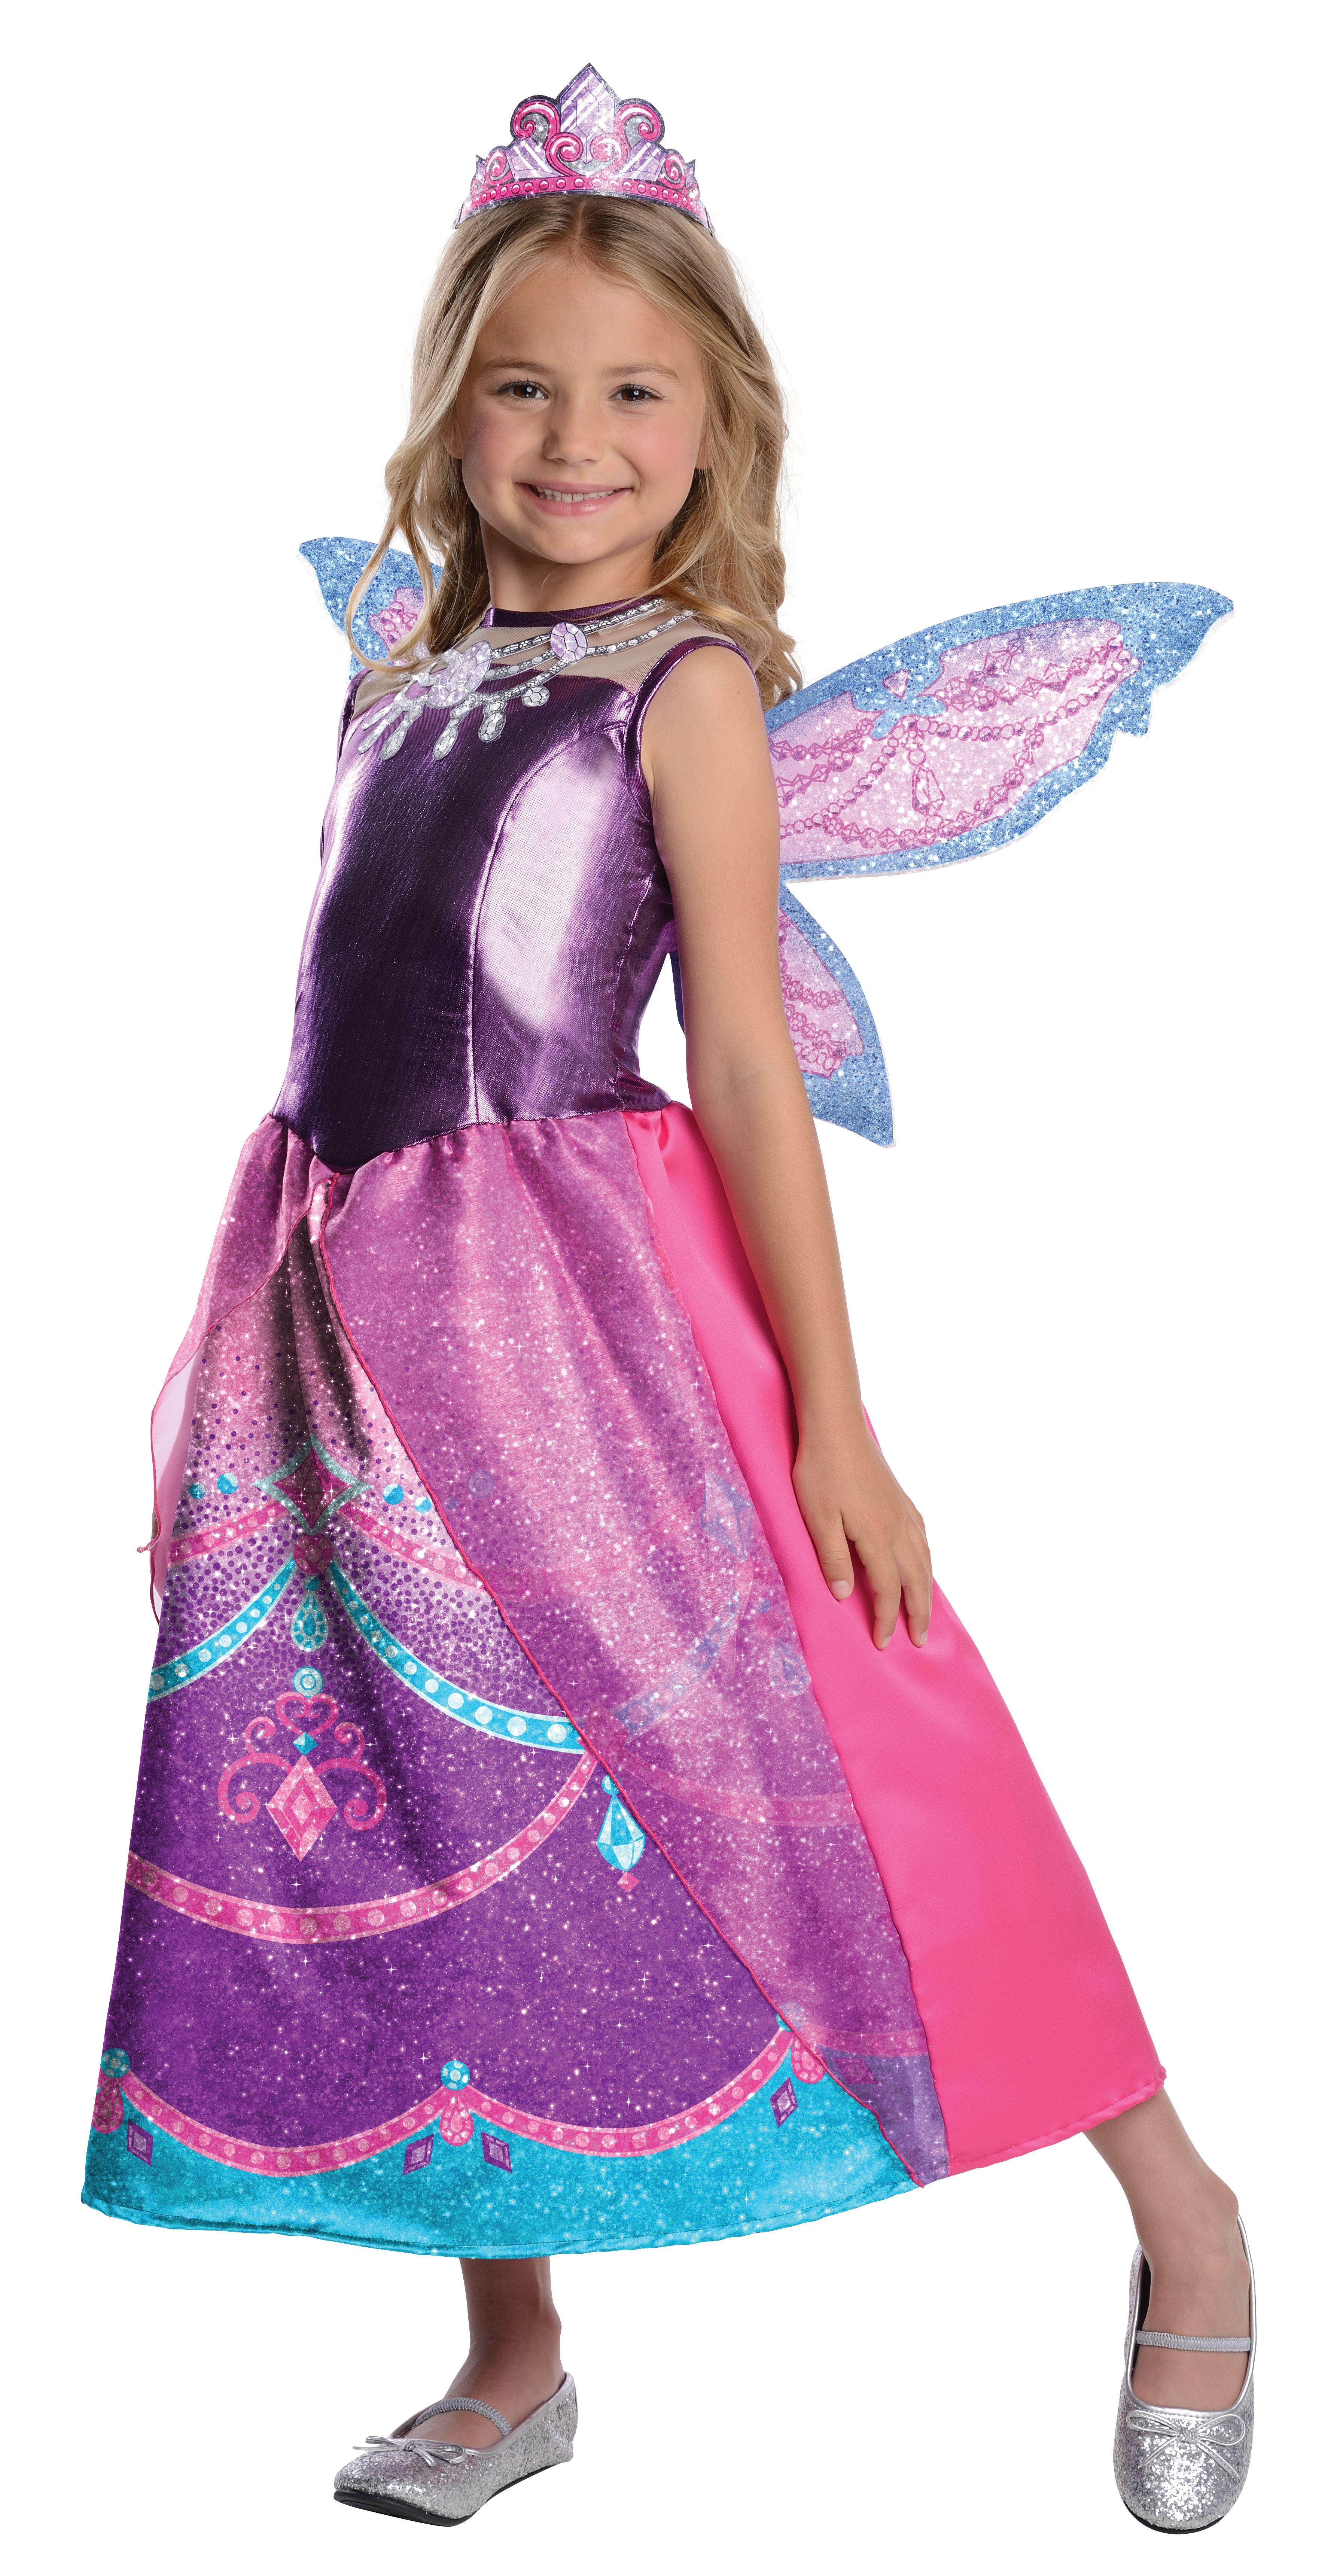 Kids Barbie Catania Girls Costume   $35.99   The Costume Land